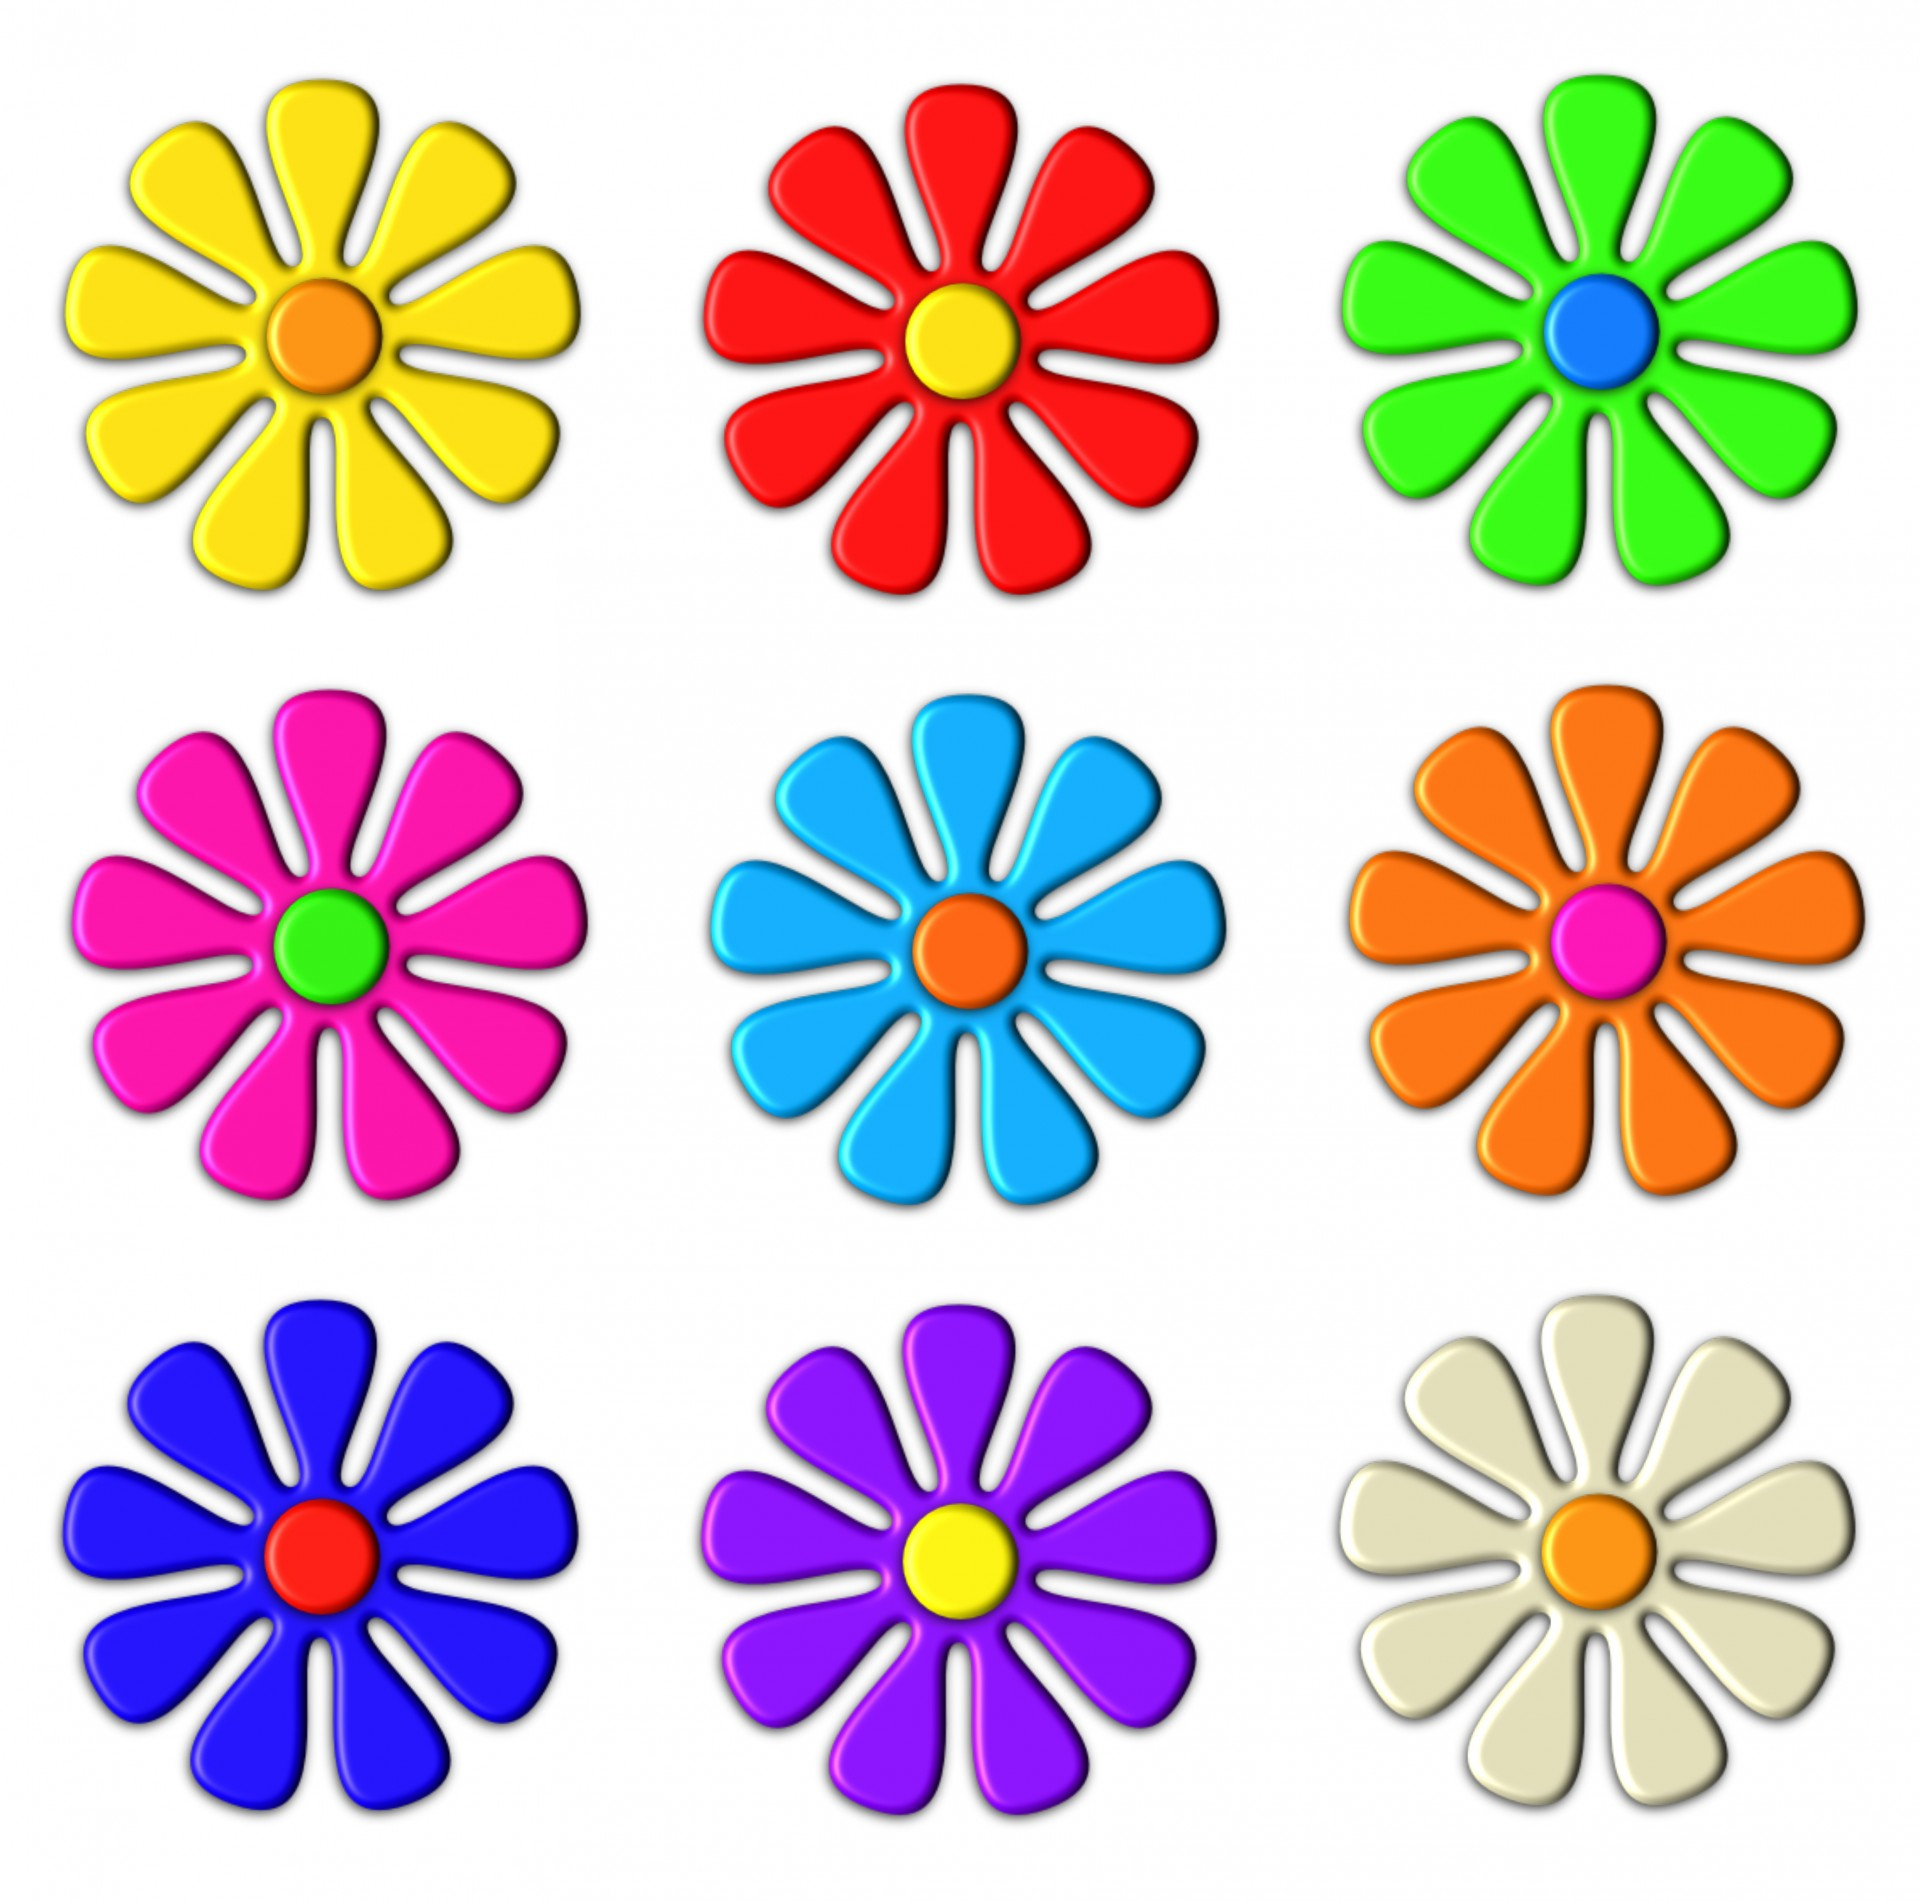 3d Flower Clip Art Free Stock Photo